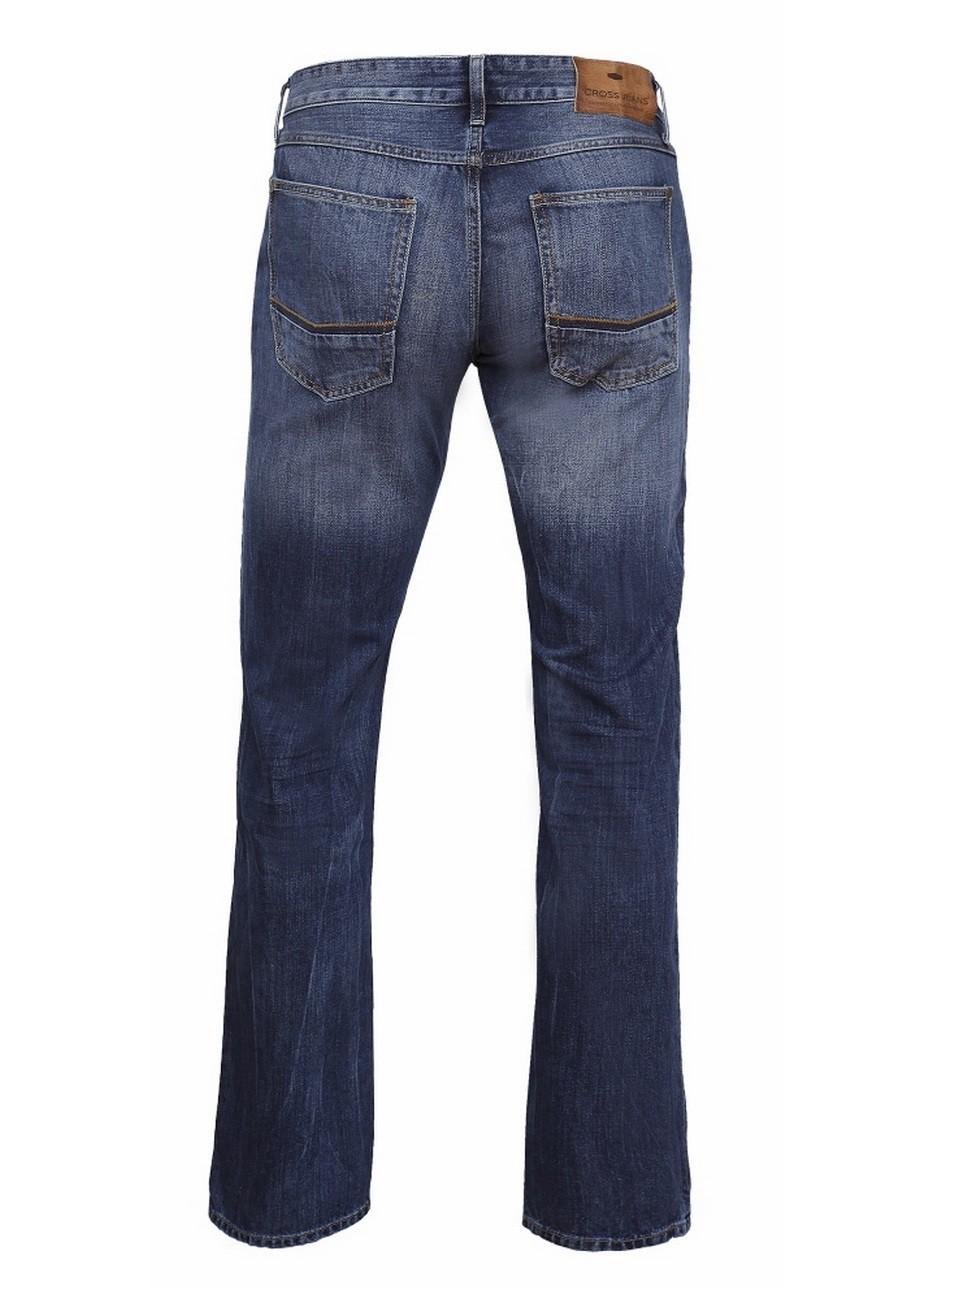 cross herren jeans antonio relax fit deep blue worn out kaufen jeans direct de. Black Bedroom Furniture Sets. Home Design Ideas